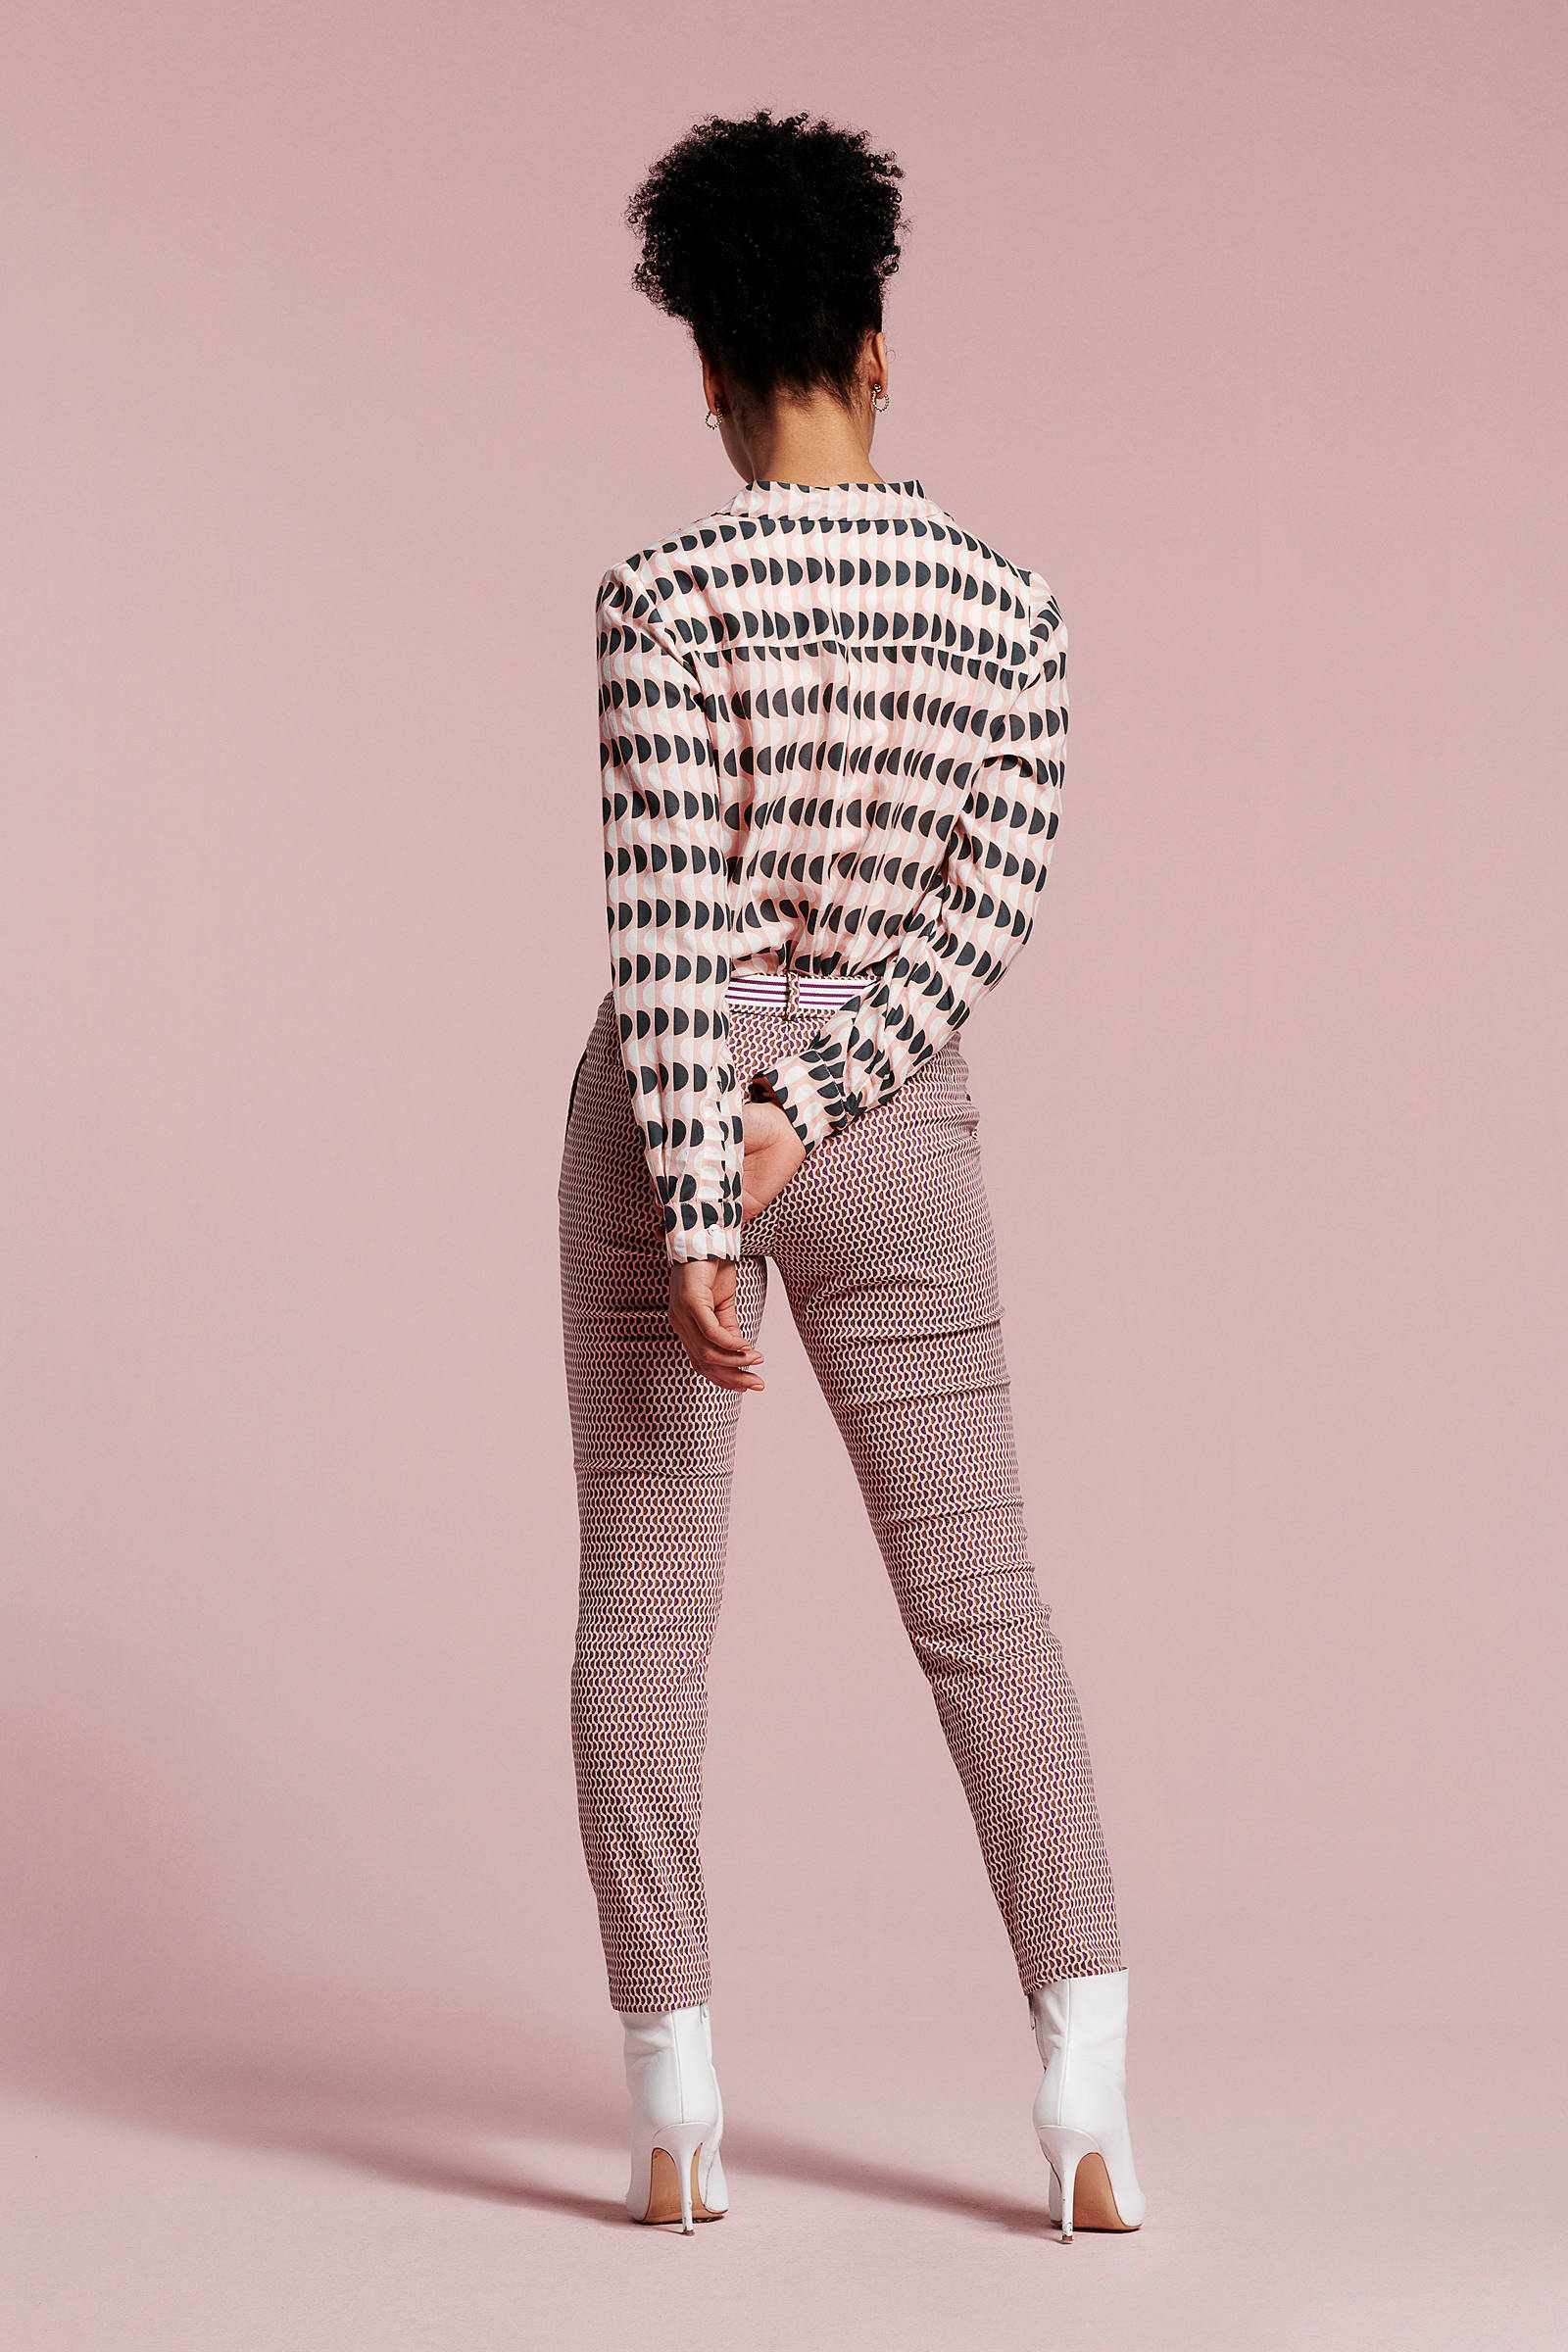 Didi patroon stip met Didi blouse blouse HvWqBfHSr